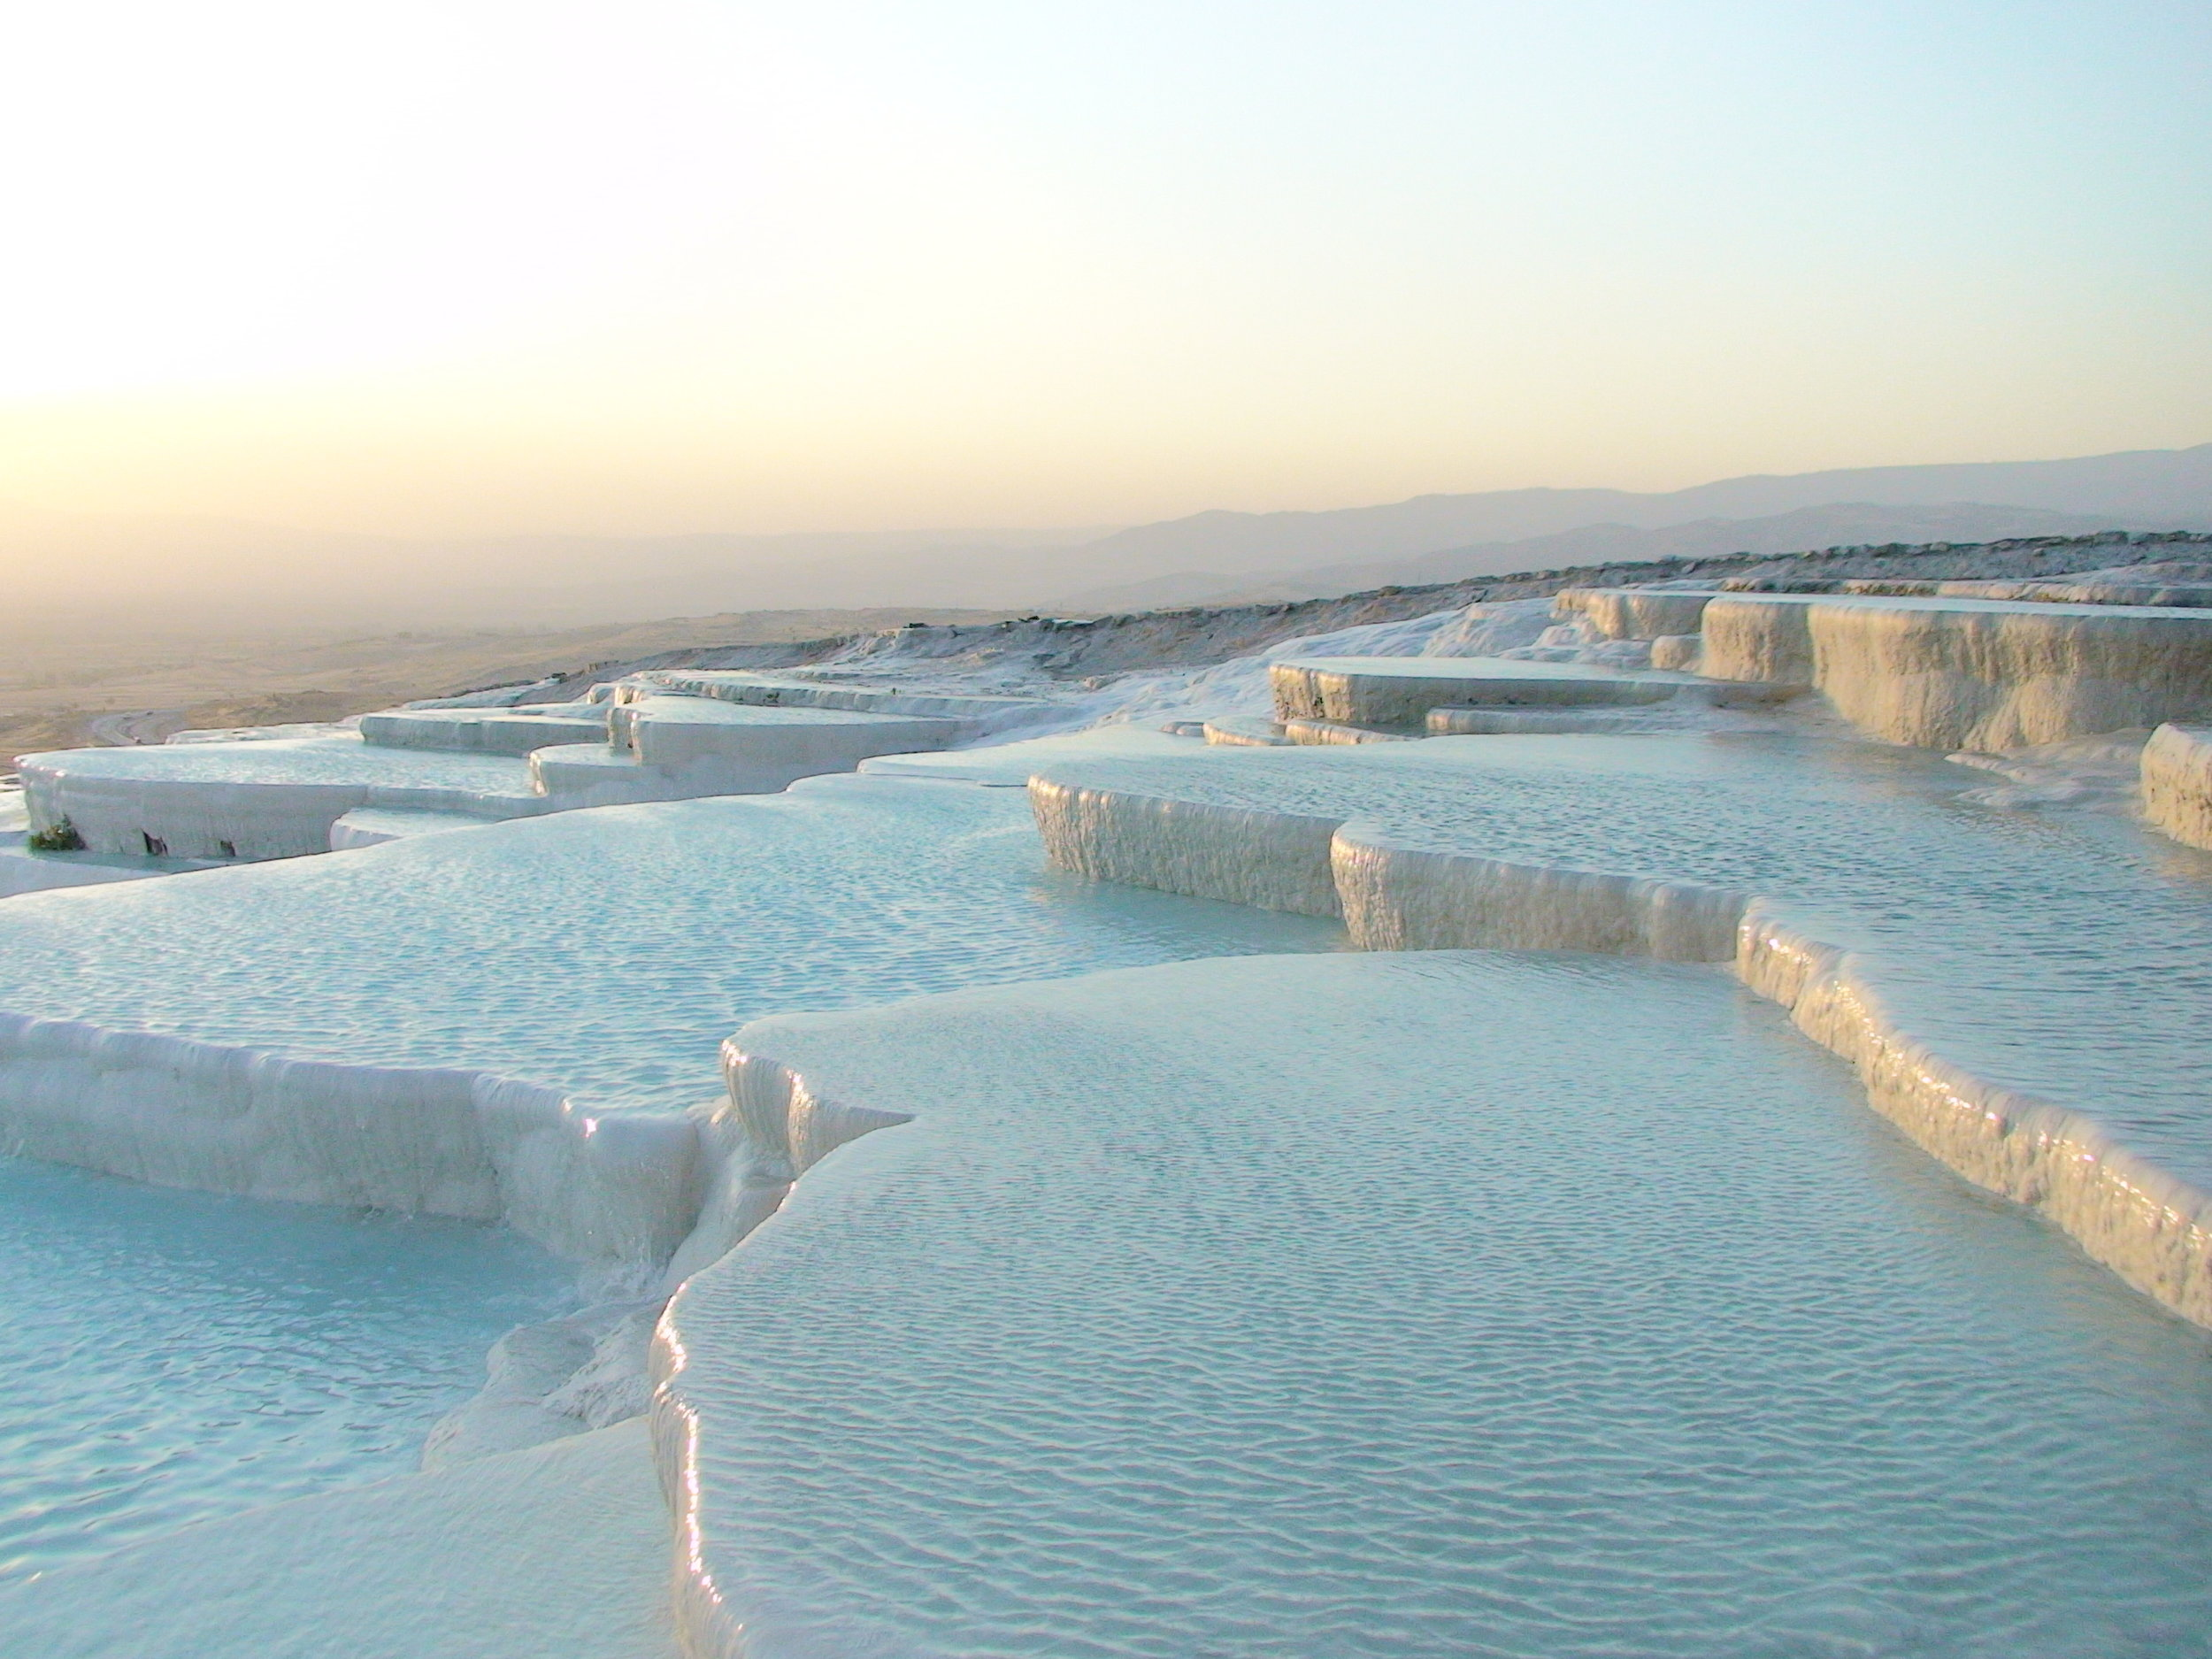 Pamukkale_Hierapolis_Travertine_pools.jpg